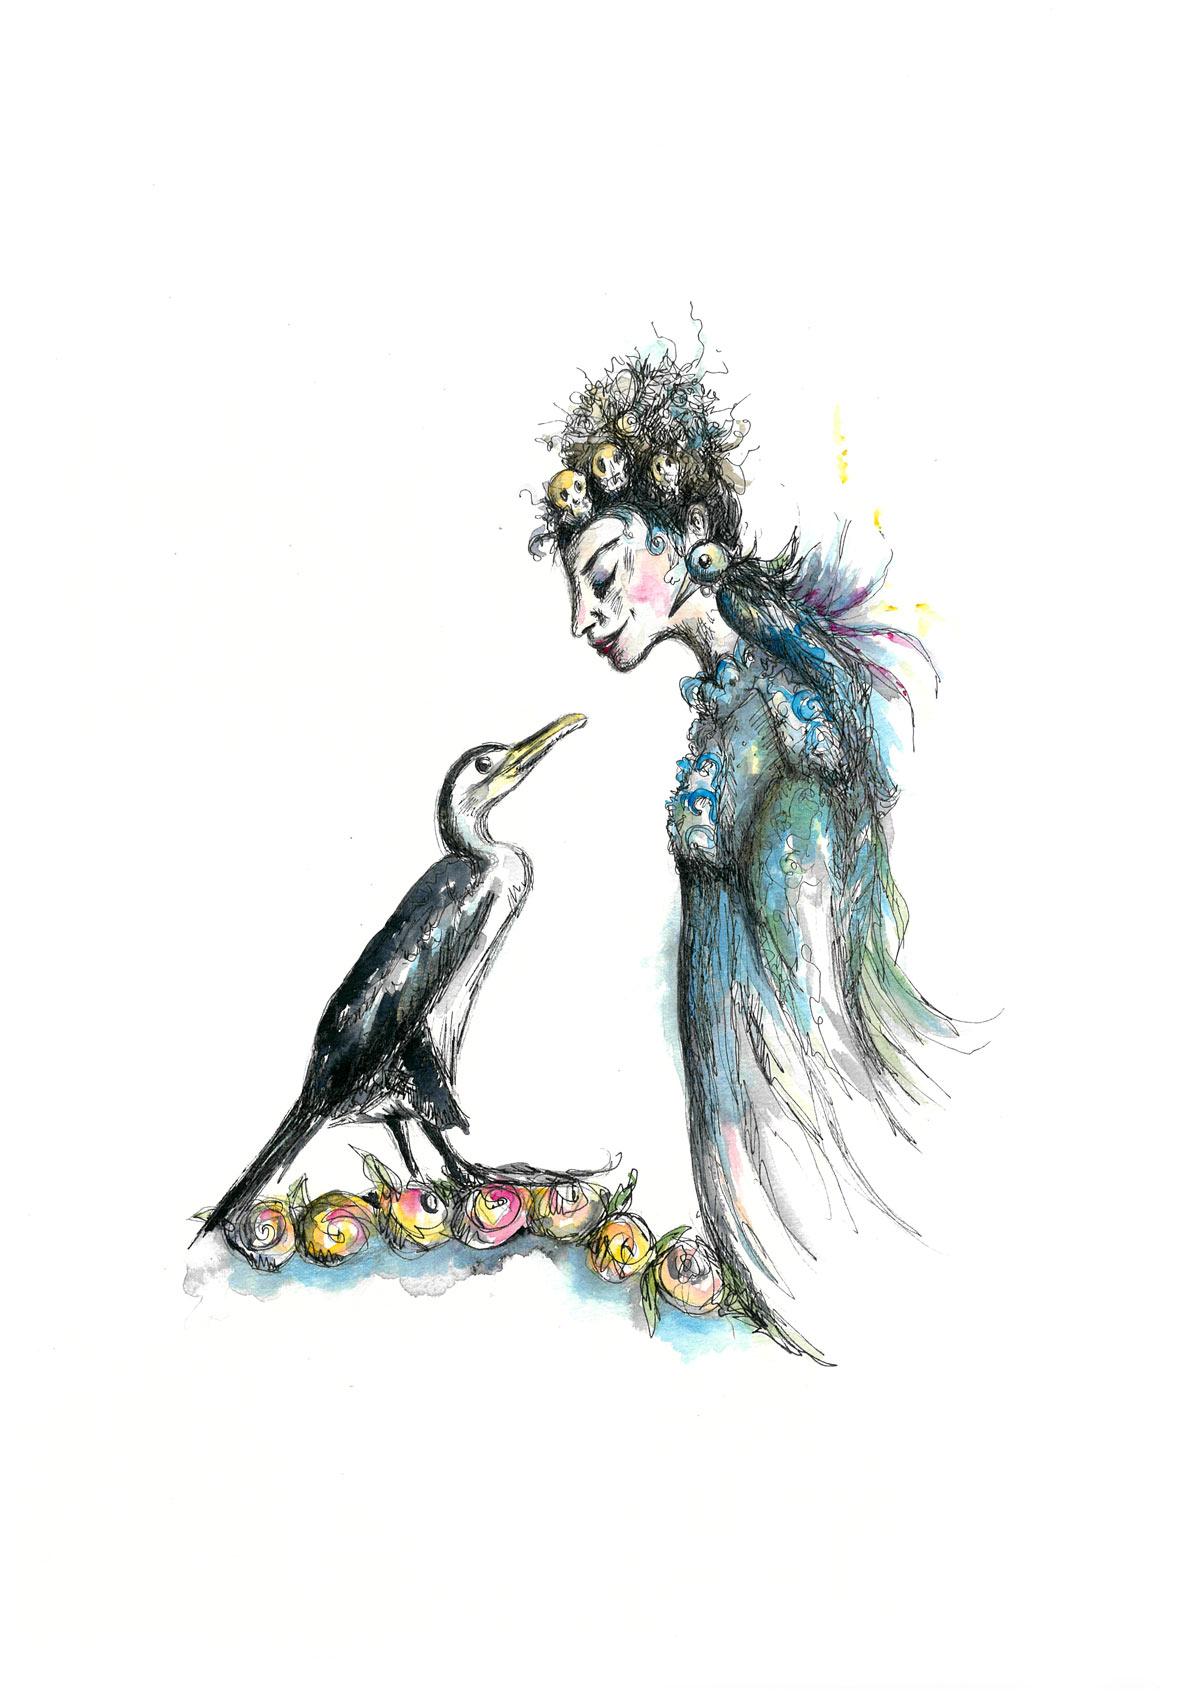 The Skull Princess – 1